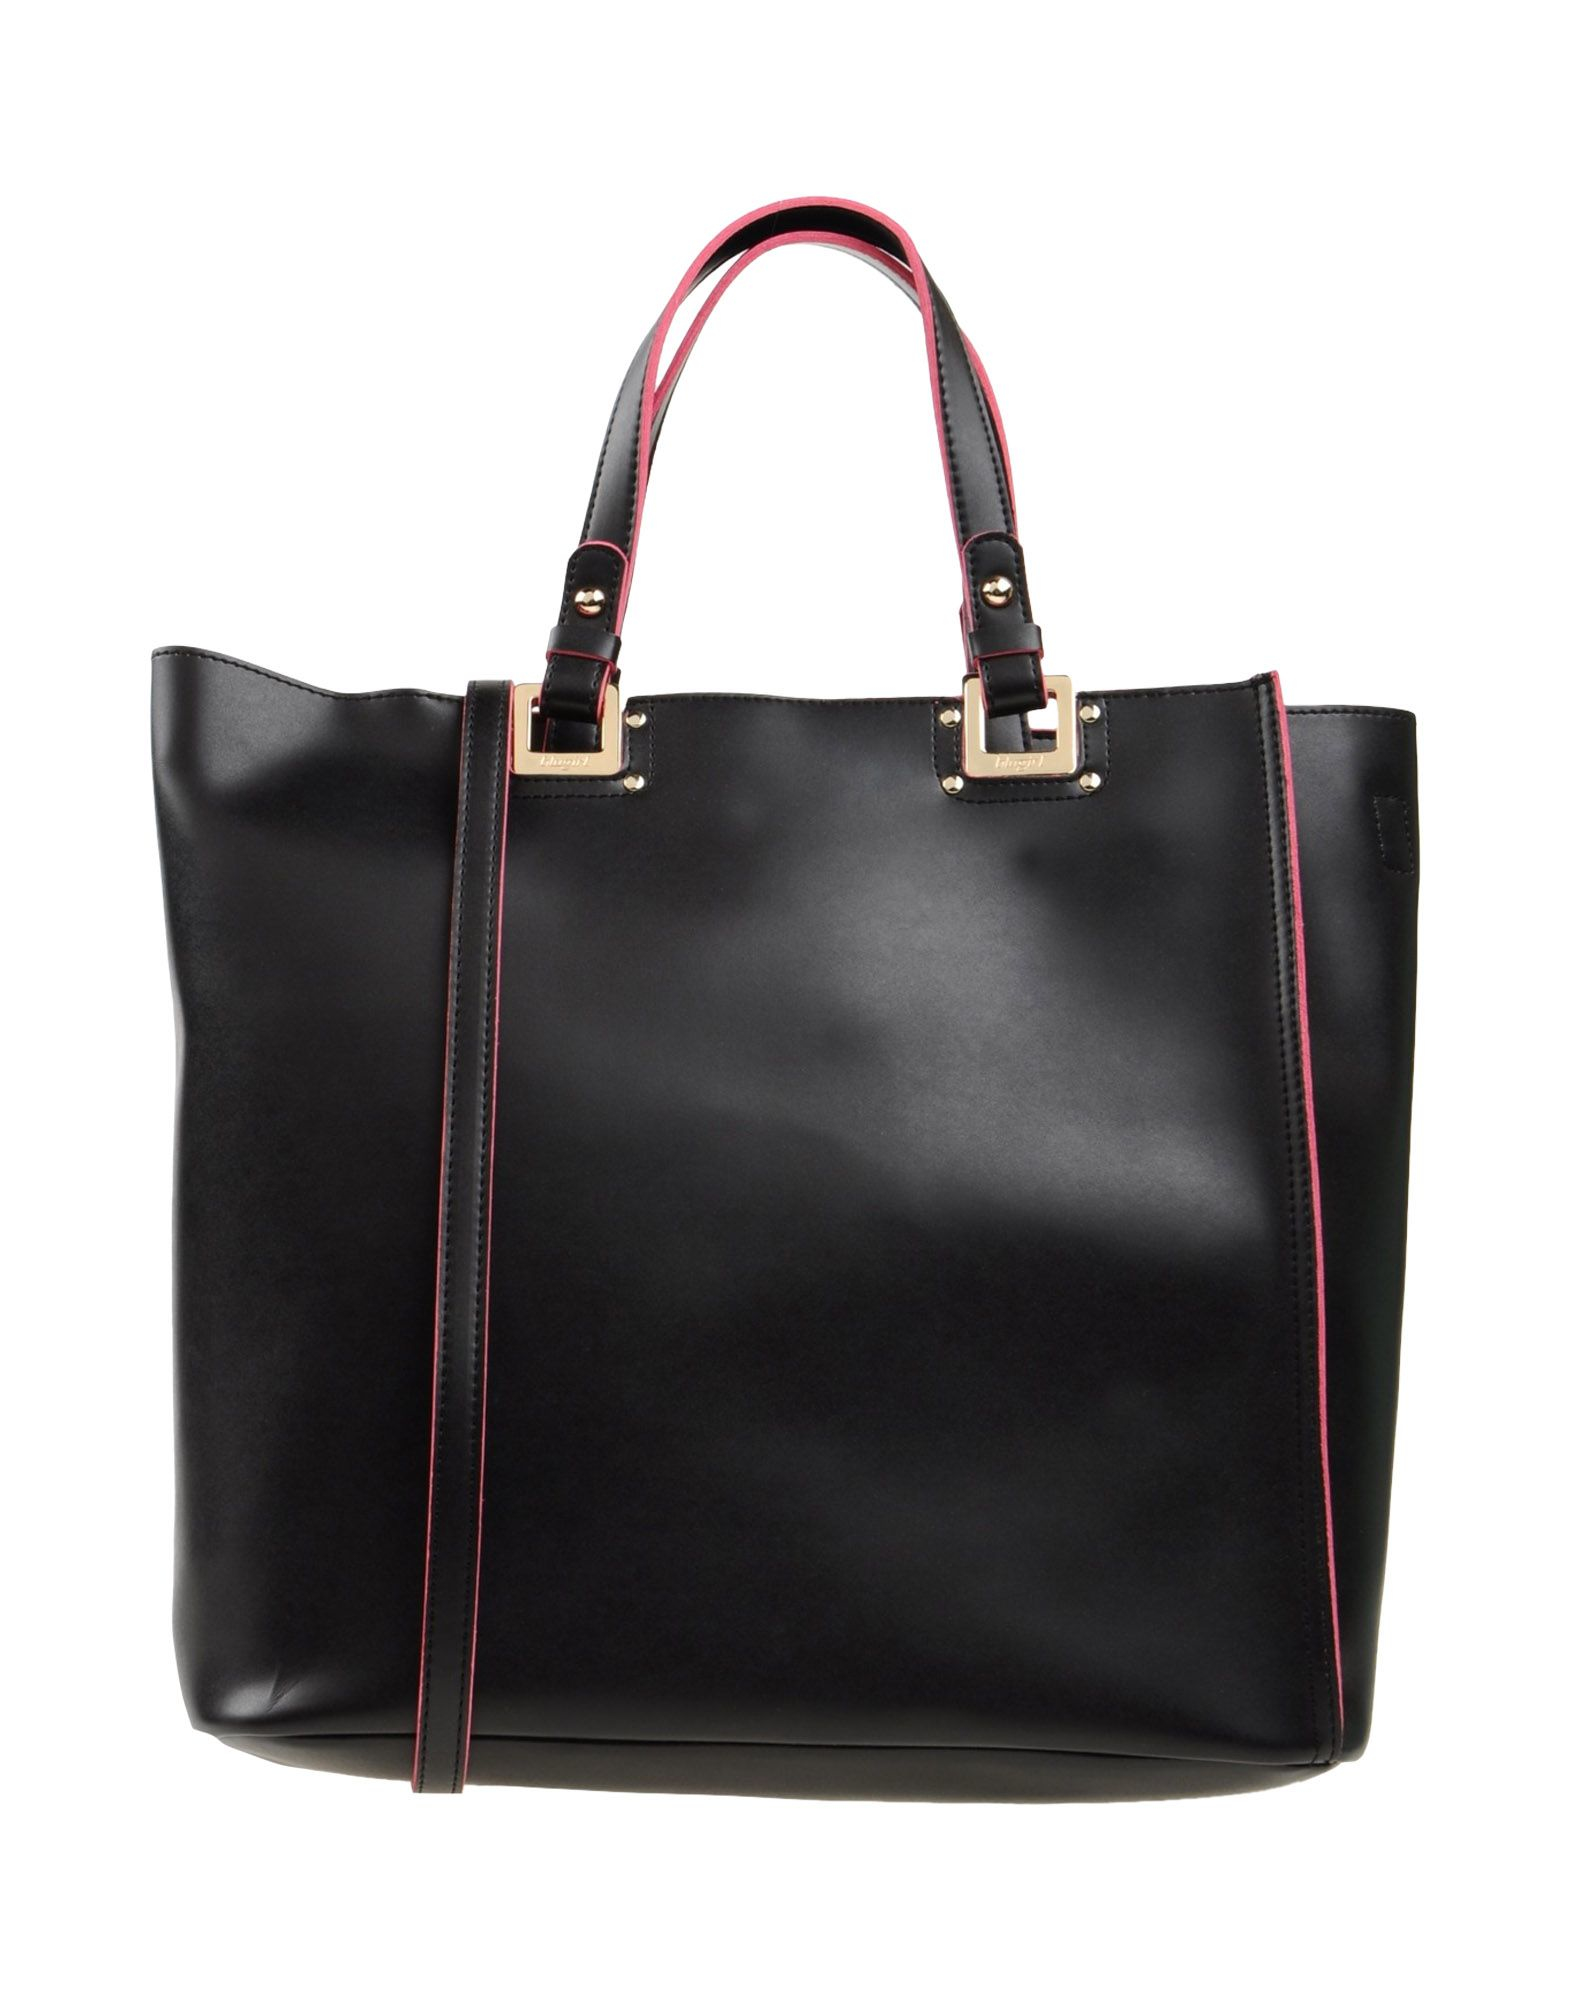 Blugirl blumarine Handbag in Black